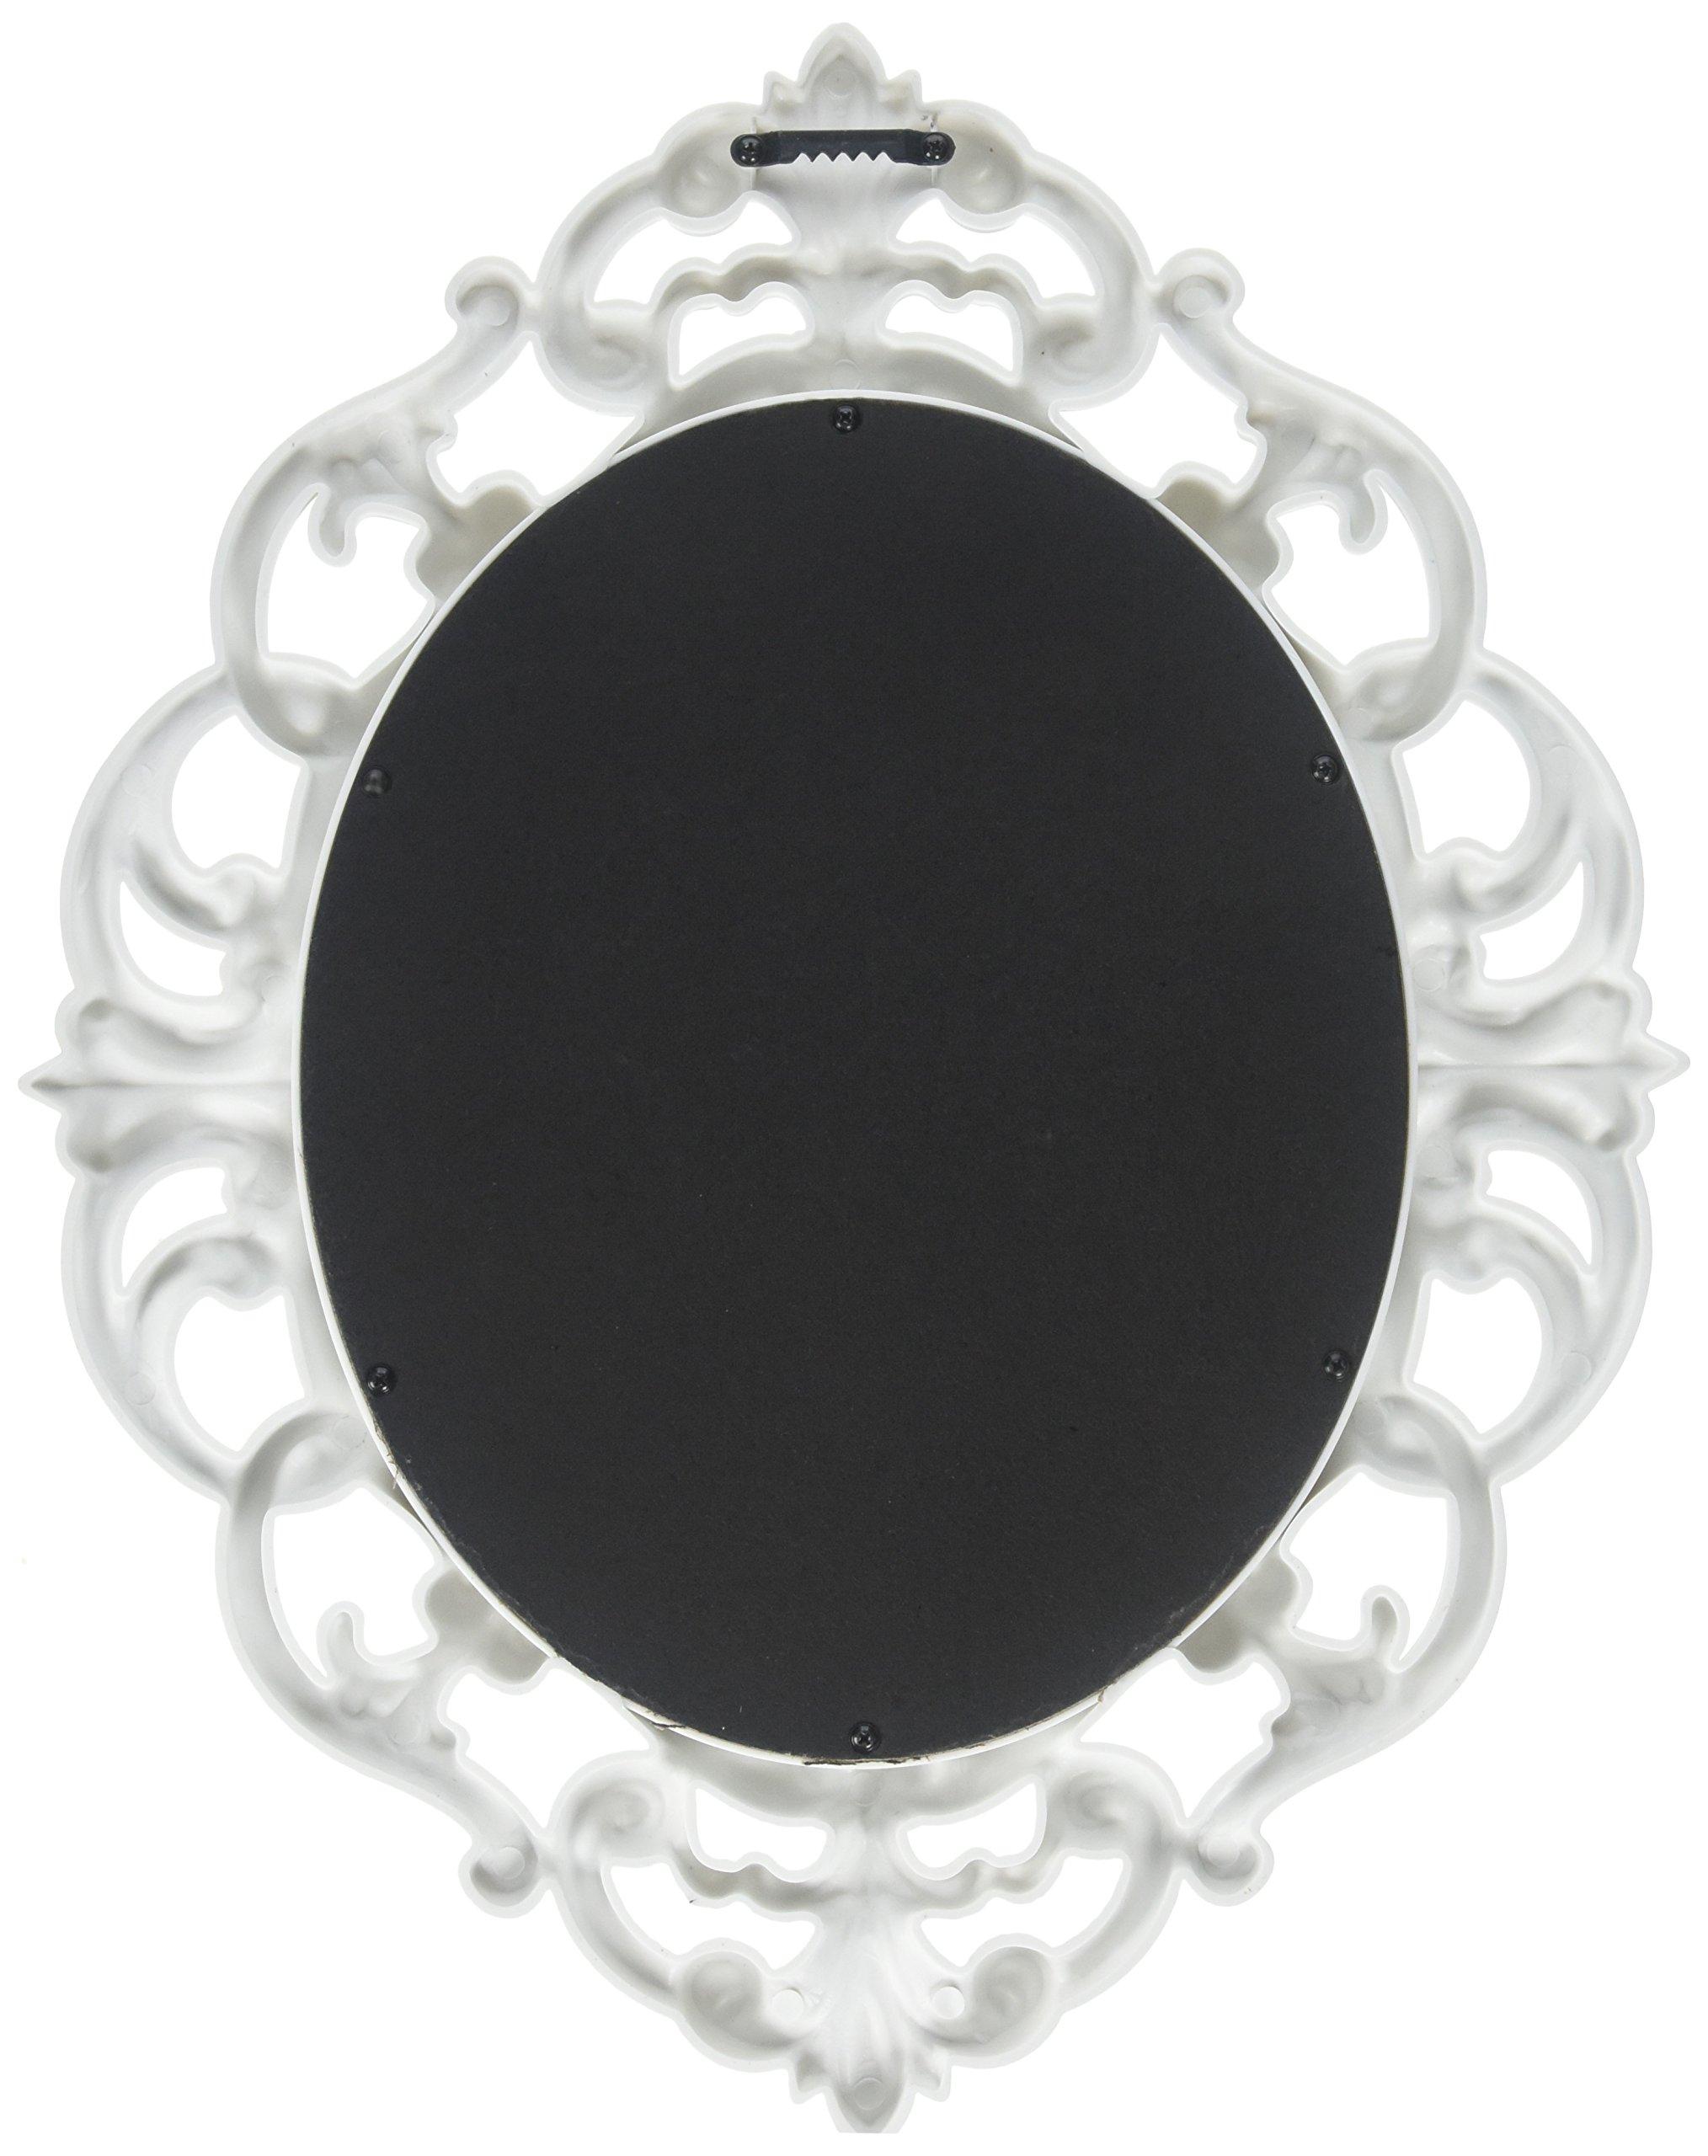 Kole White Oval Vintage Wall Mirror by Kole (Image #2)